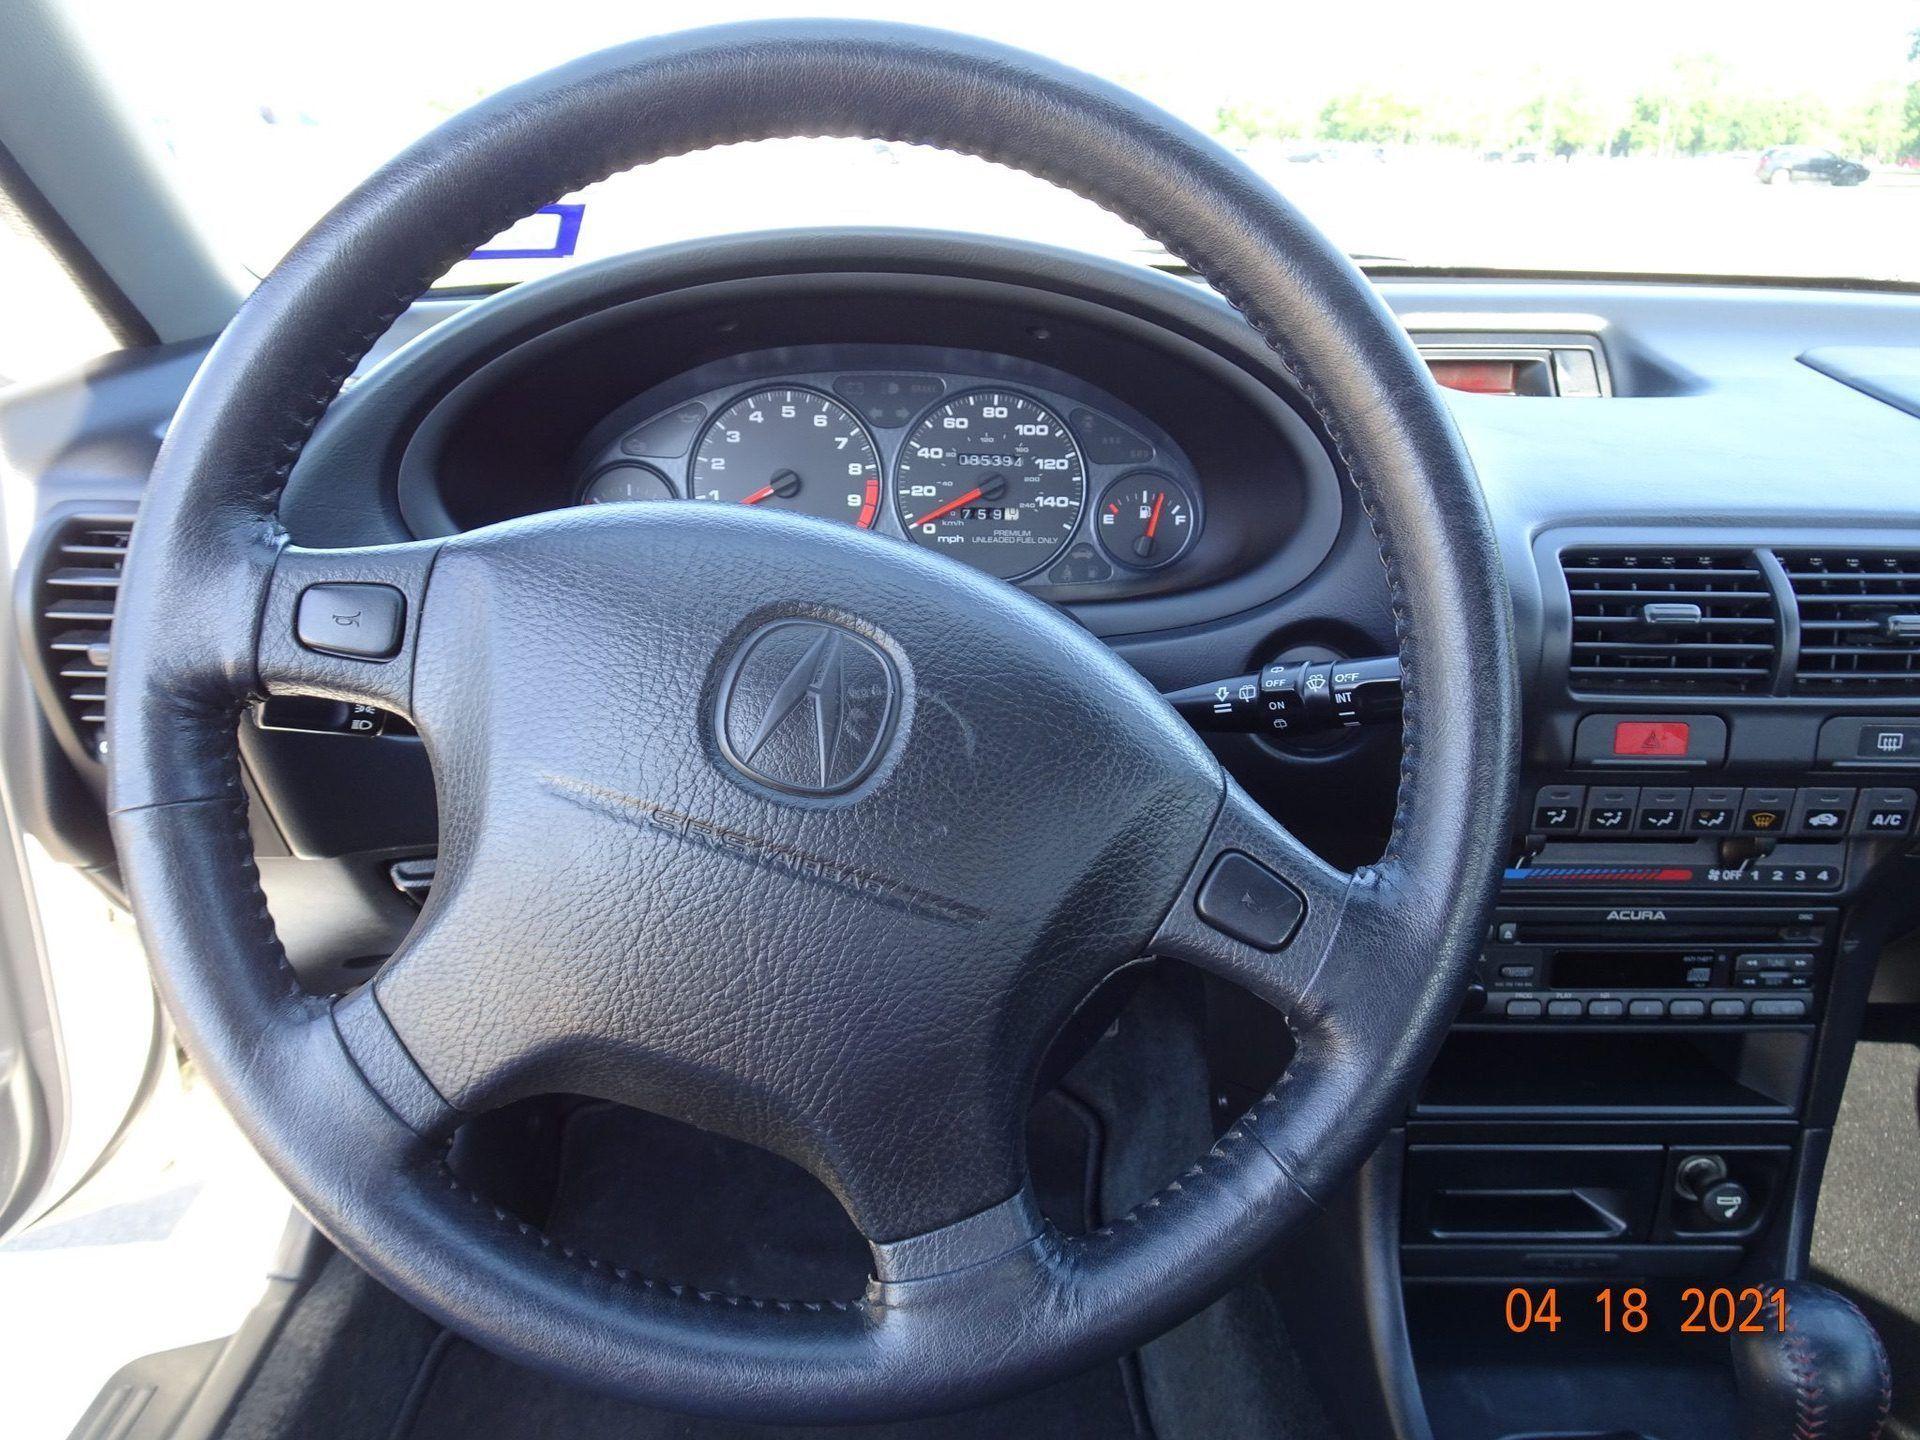 1998-Acura-Integra-Type-R-0004